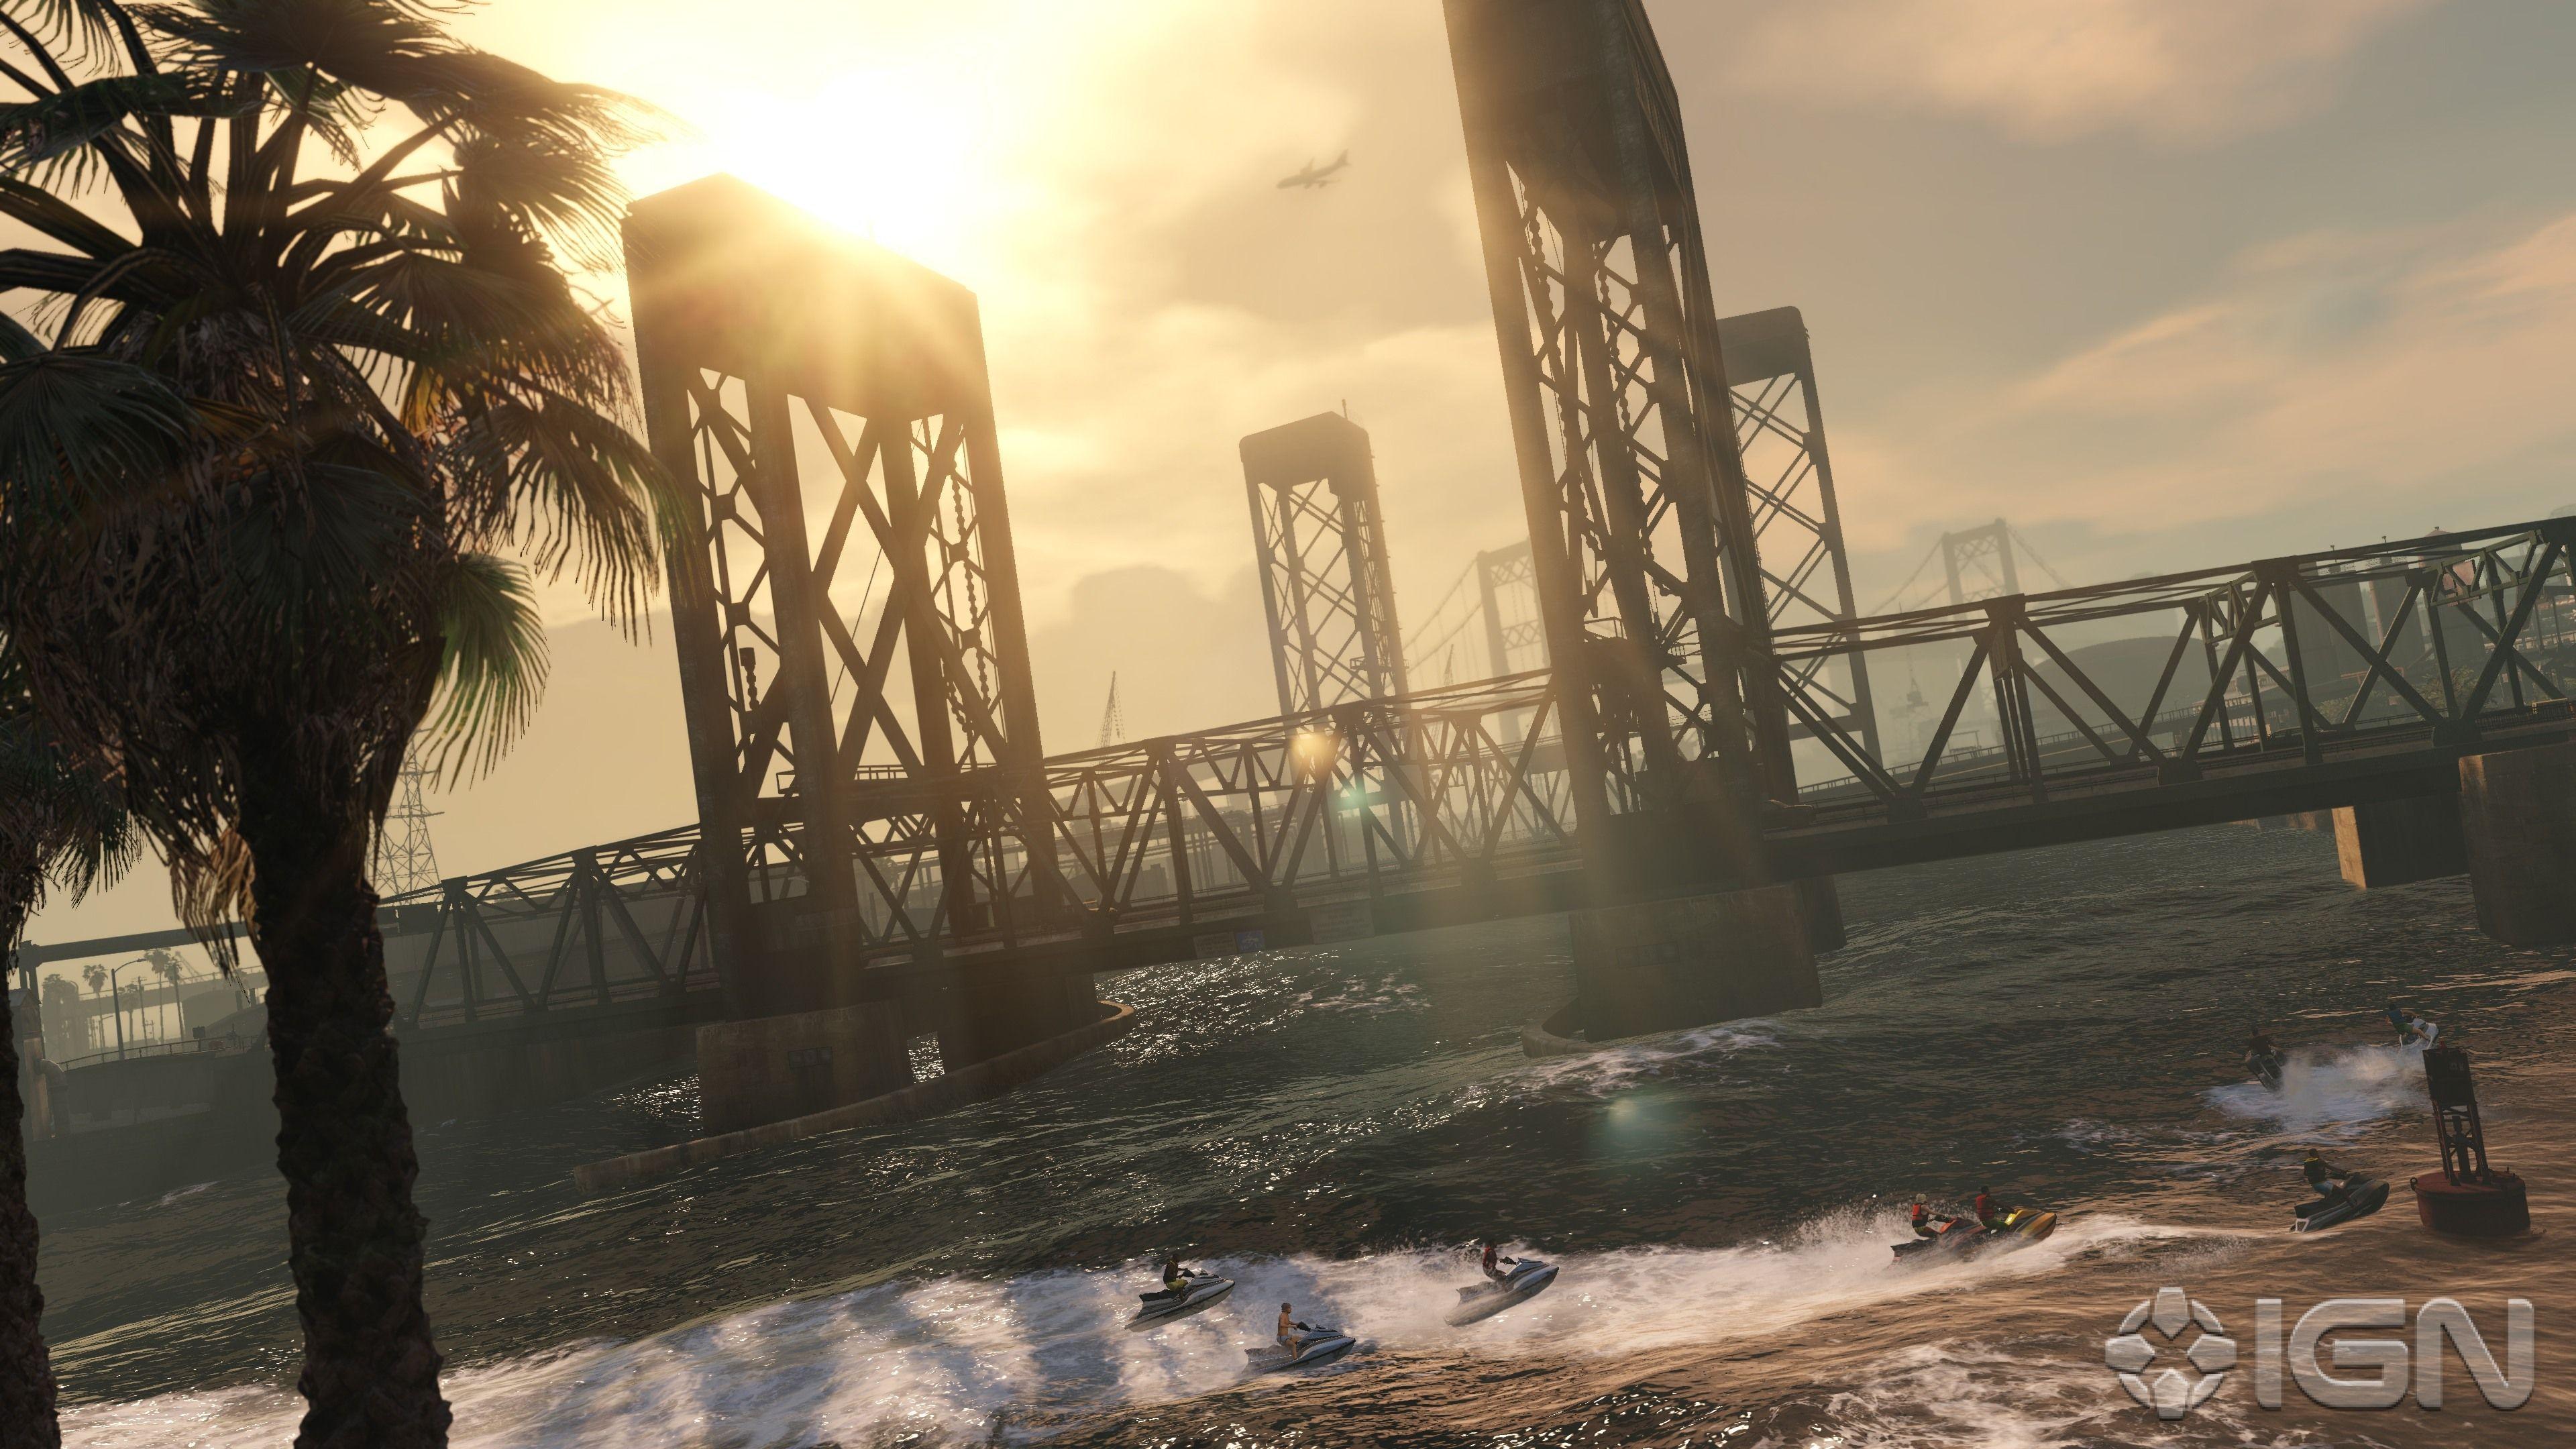 25 New Gta 5 Pc Screenshots At 4k Ign Grand Theft Auto Digital Artwork Photoshop Hd Wallpaper